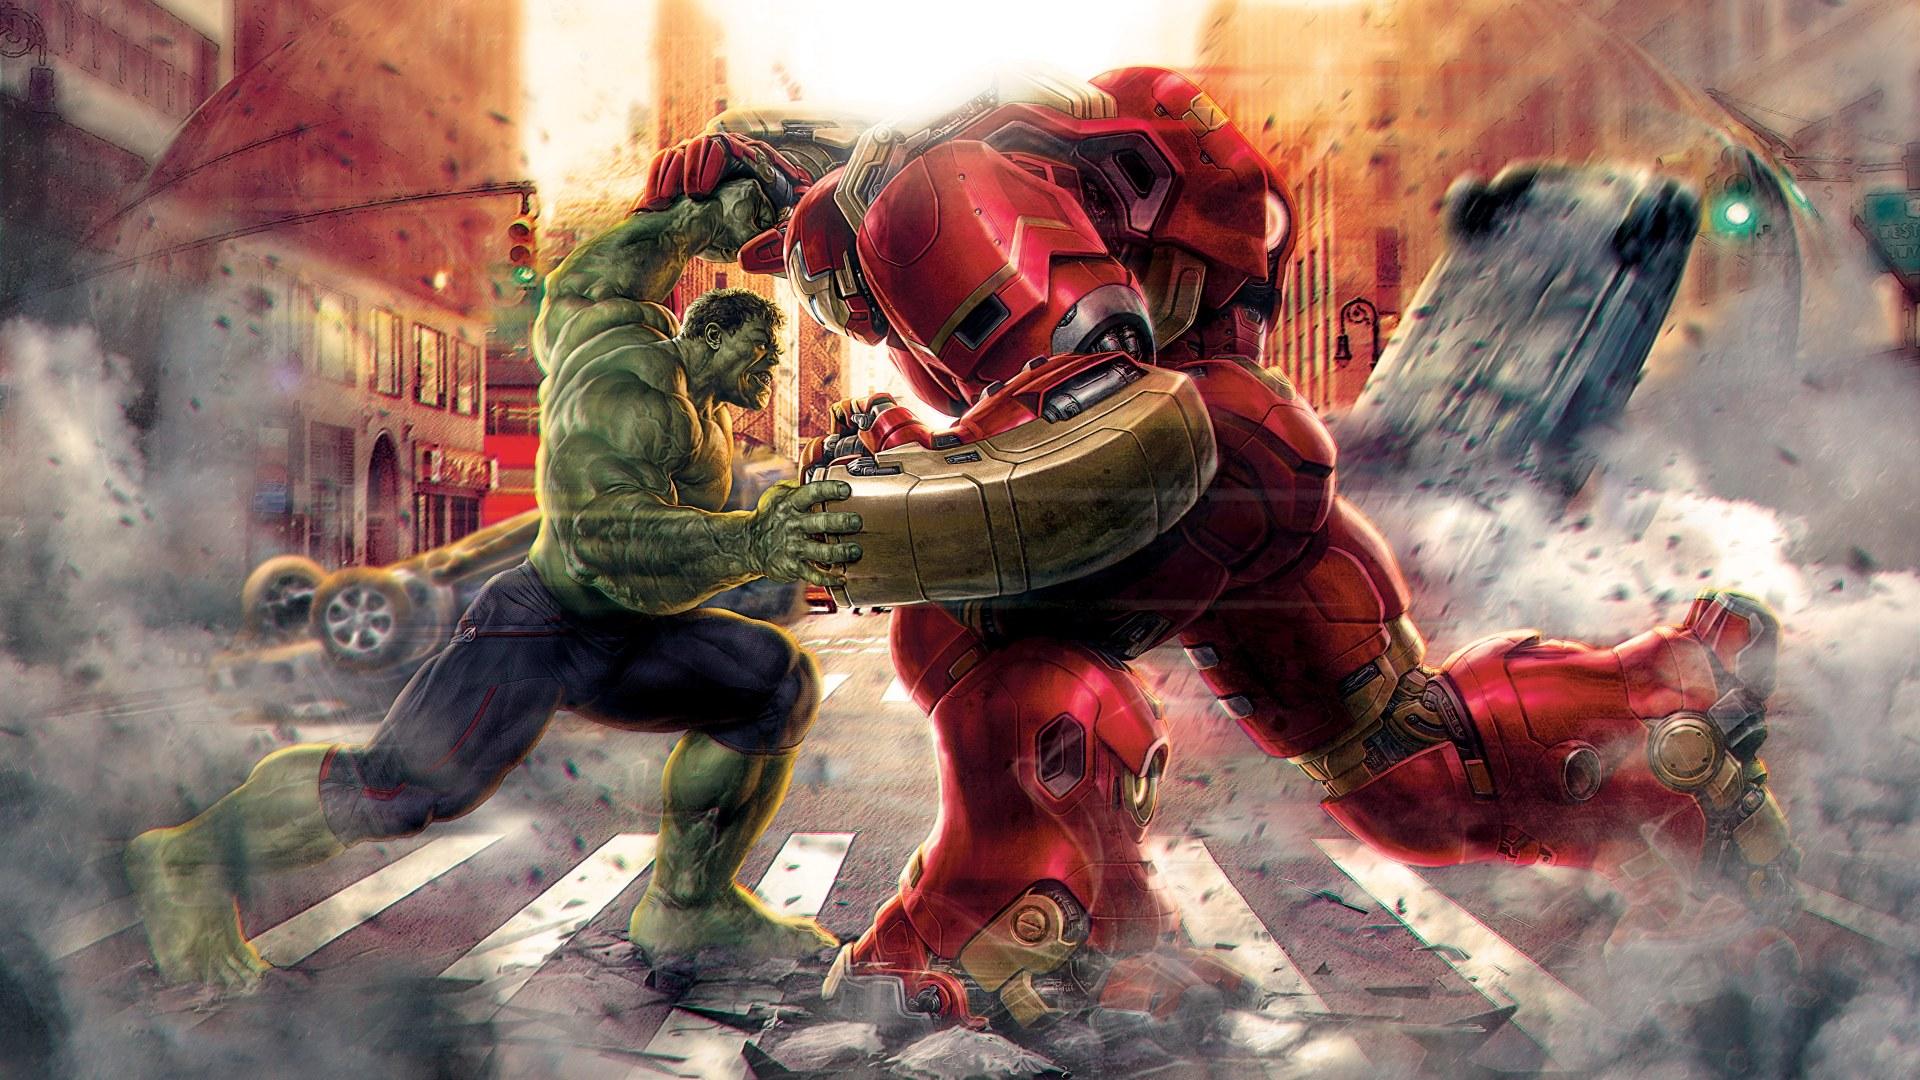 Hulk-vs-Hulkbuster-Avengers-Age-of-Ultron-by-Steeven-on-Deviantart-1920%C3%971080-wallpaper-wpc5806155